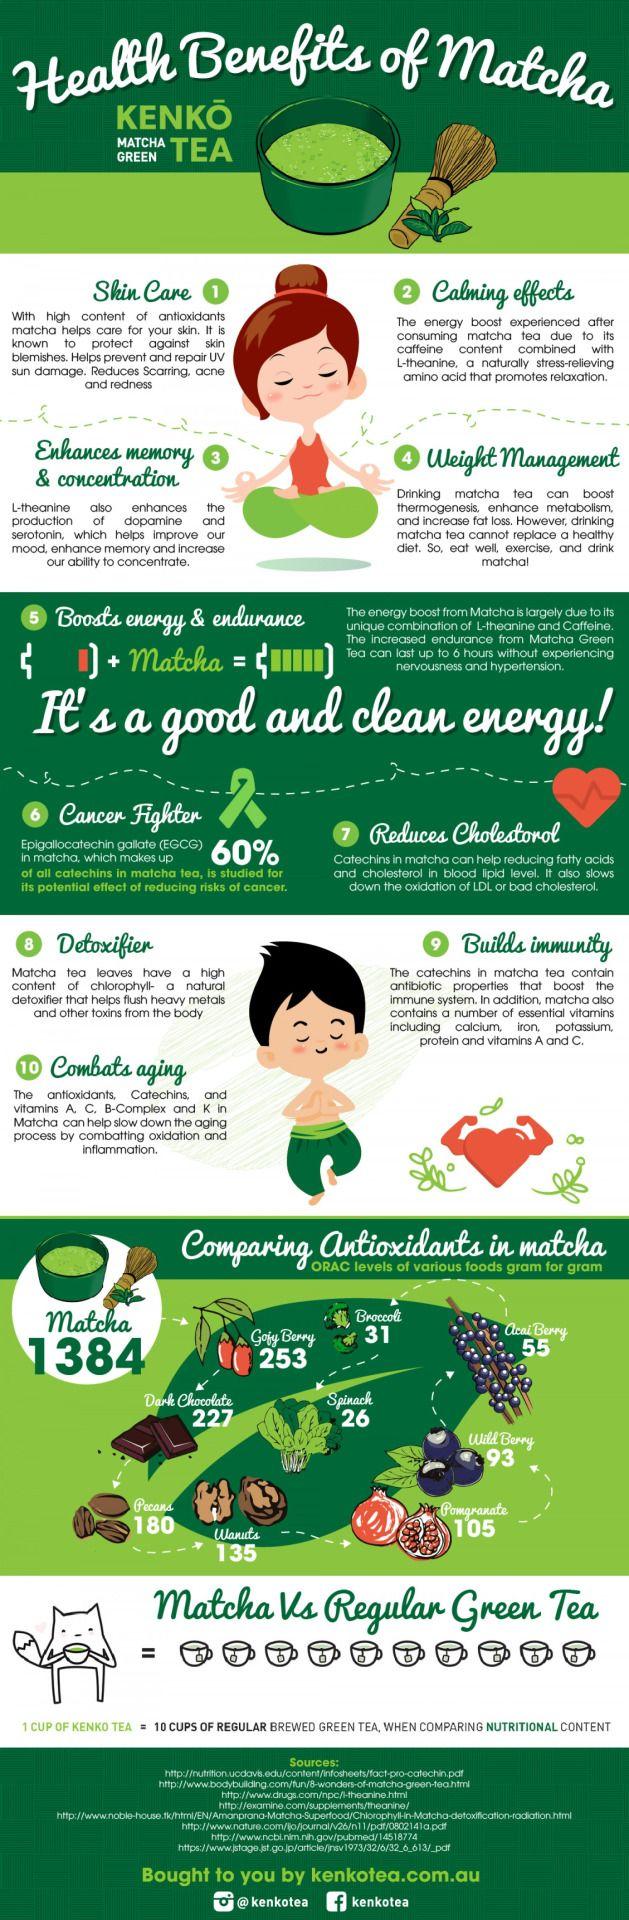 MATCHA Green Tea Powder - Fat Burner - 100% USDA Organic Certified - 137x ANTIOXIDANTS Than Brewed Green Tea - Sugar Free - Great for Green Tea Latte, Smoothie, Ice Cream and Baking - Coffee...